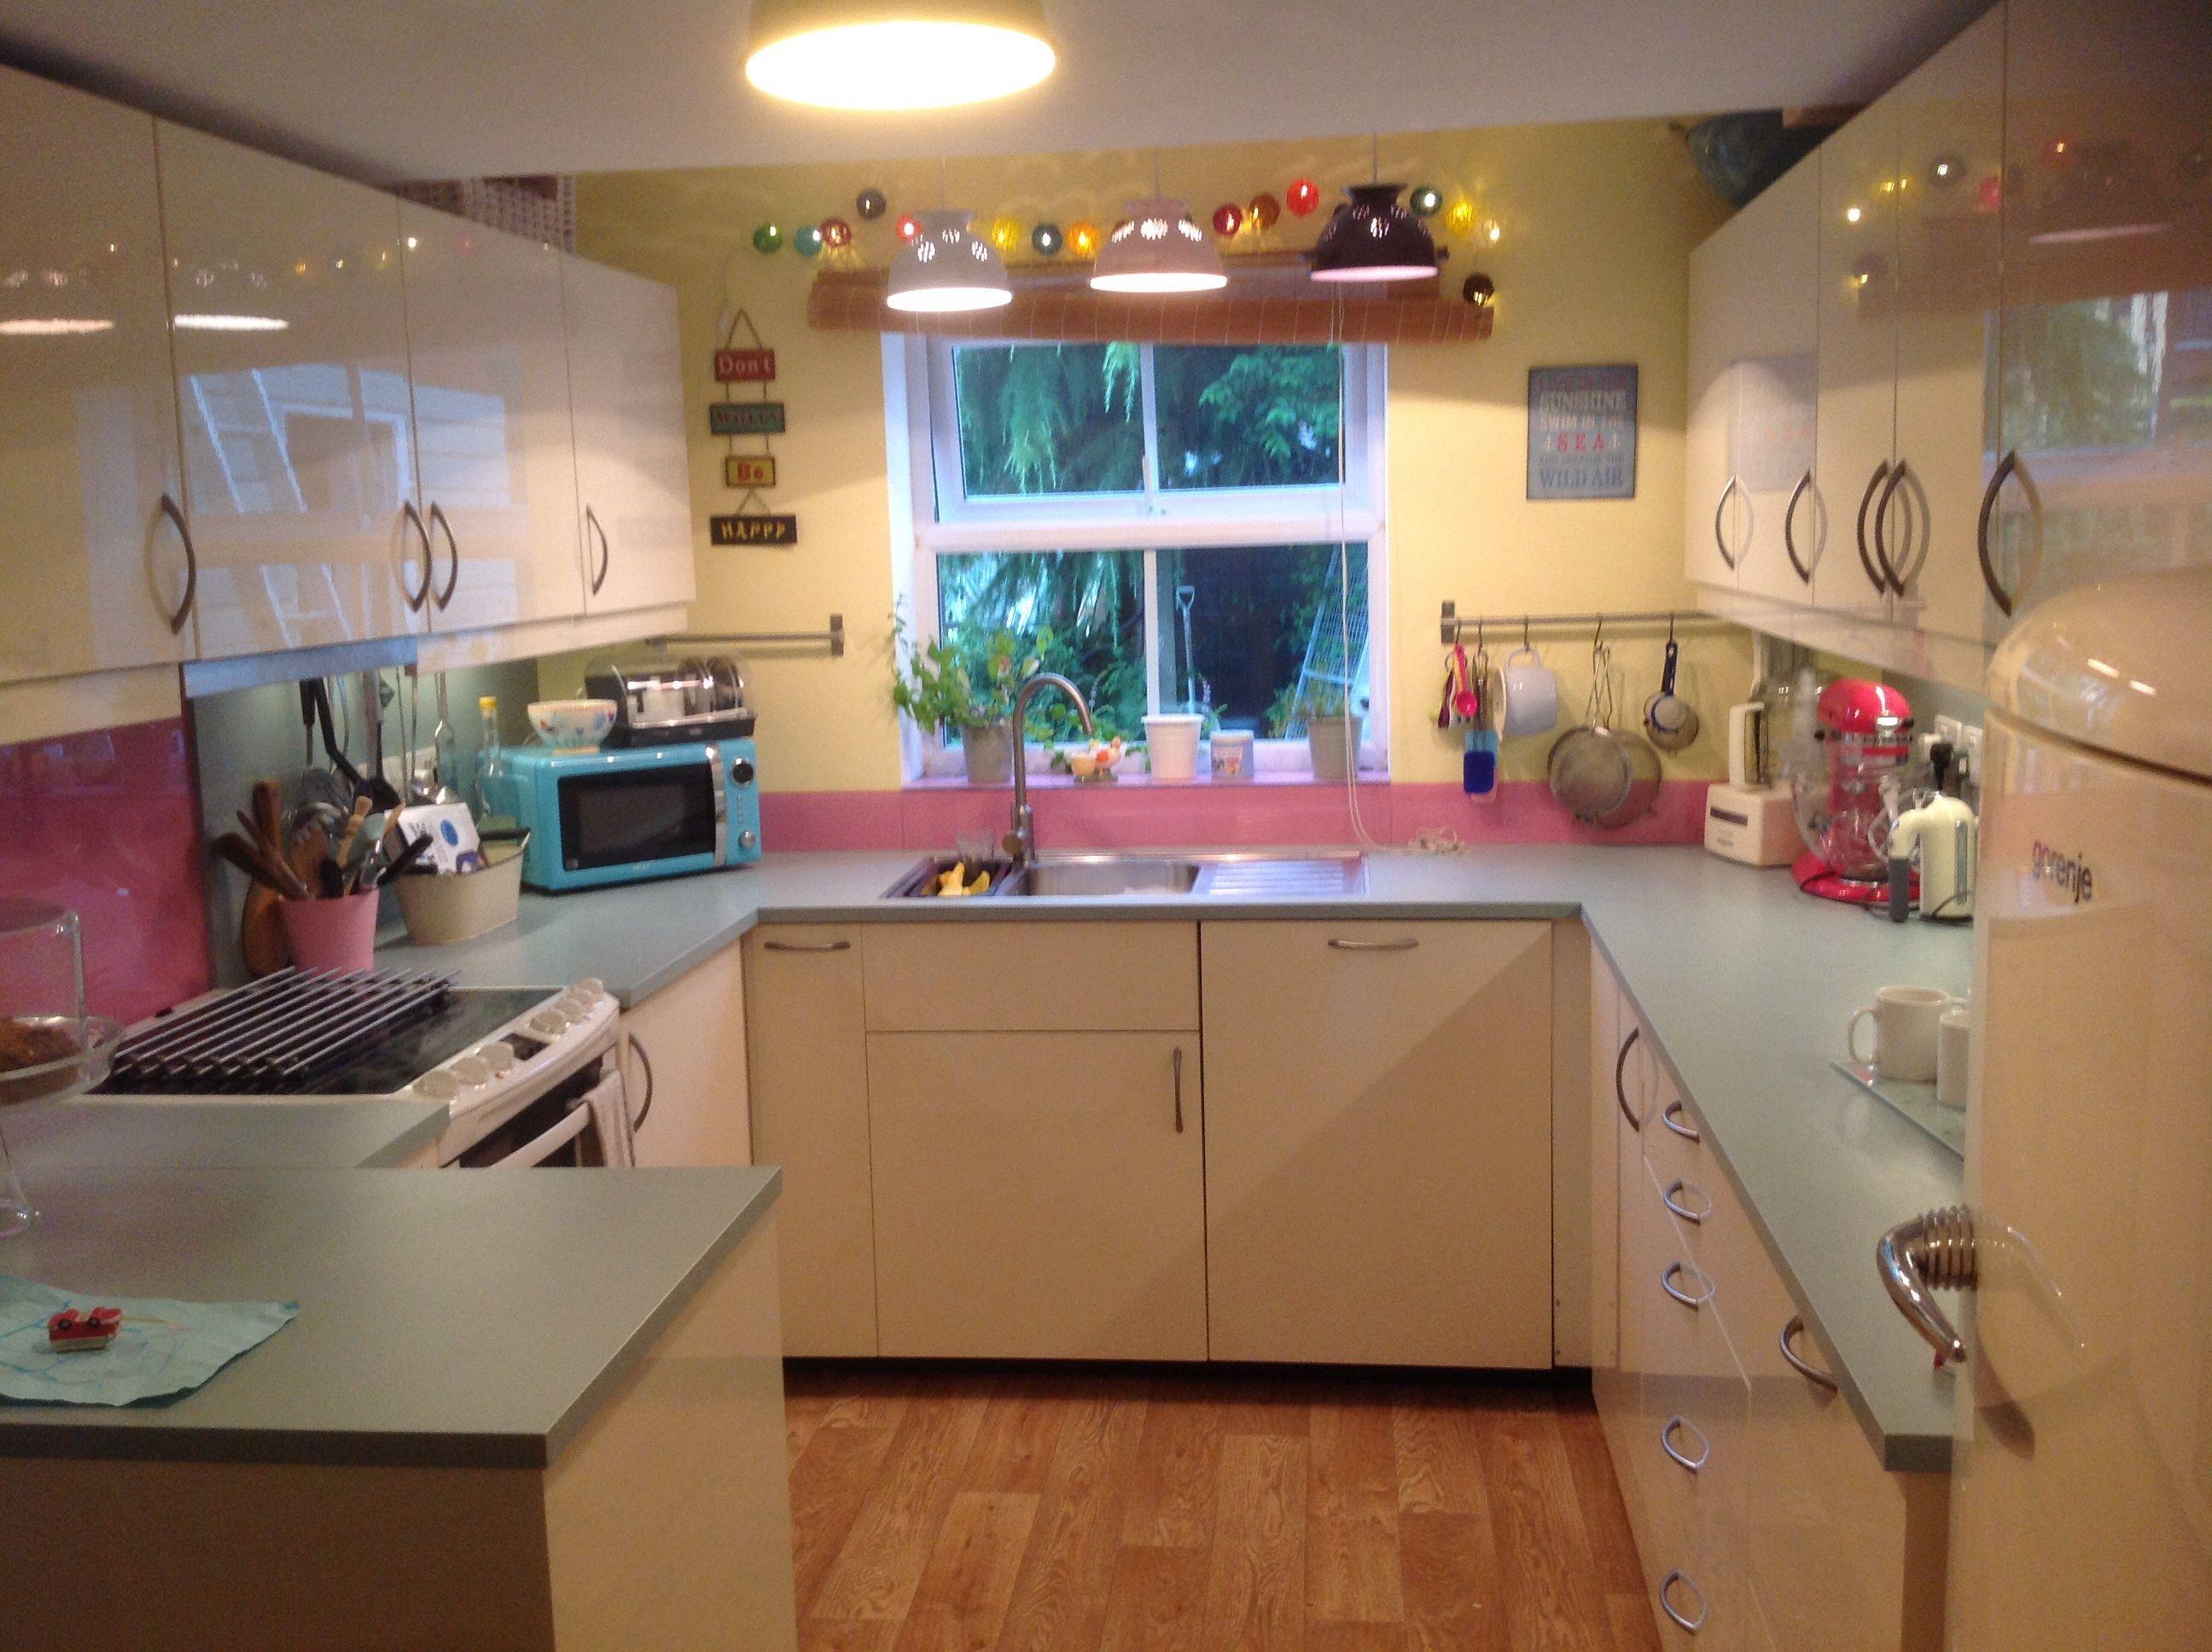 Küchenrückwand Ikea ~ Isola cucina ikea cucina kitchenware and kitchens